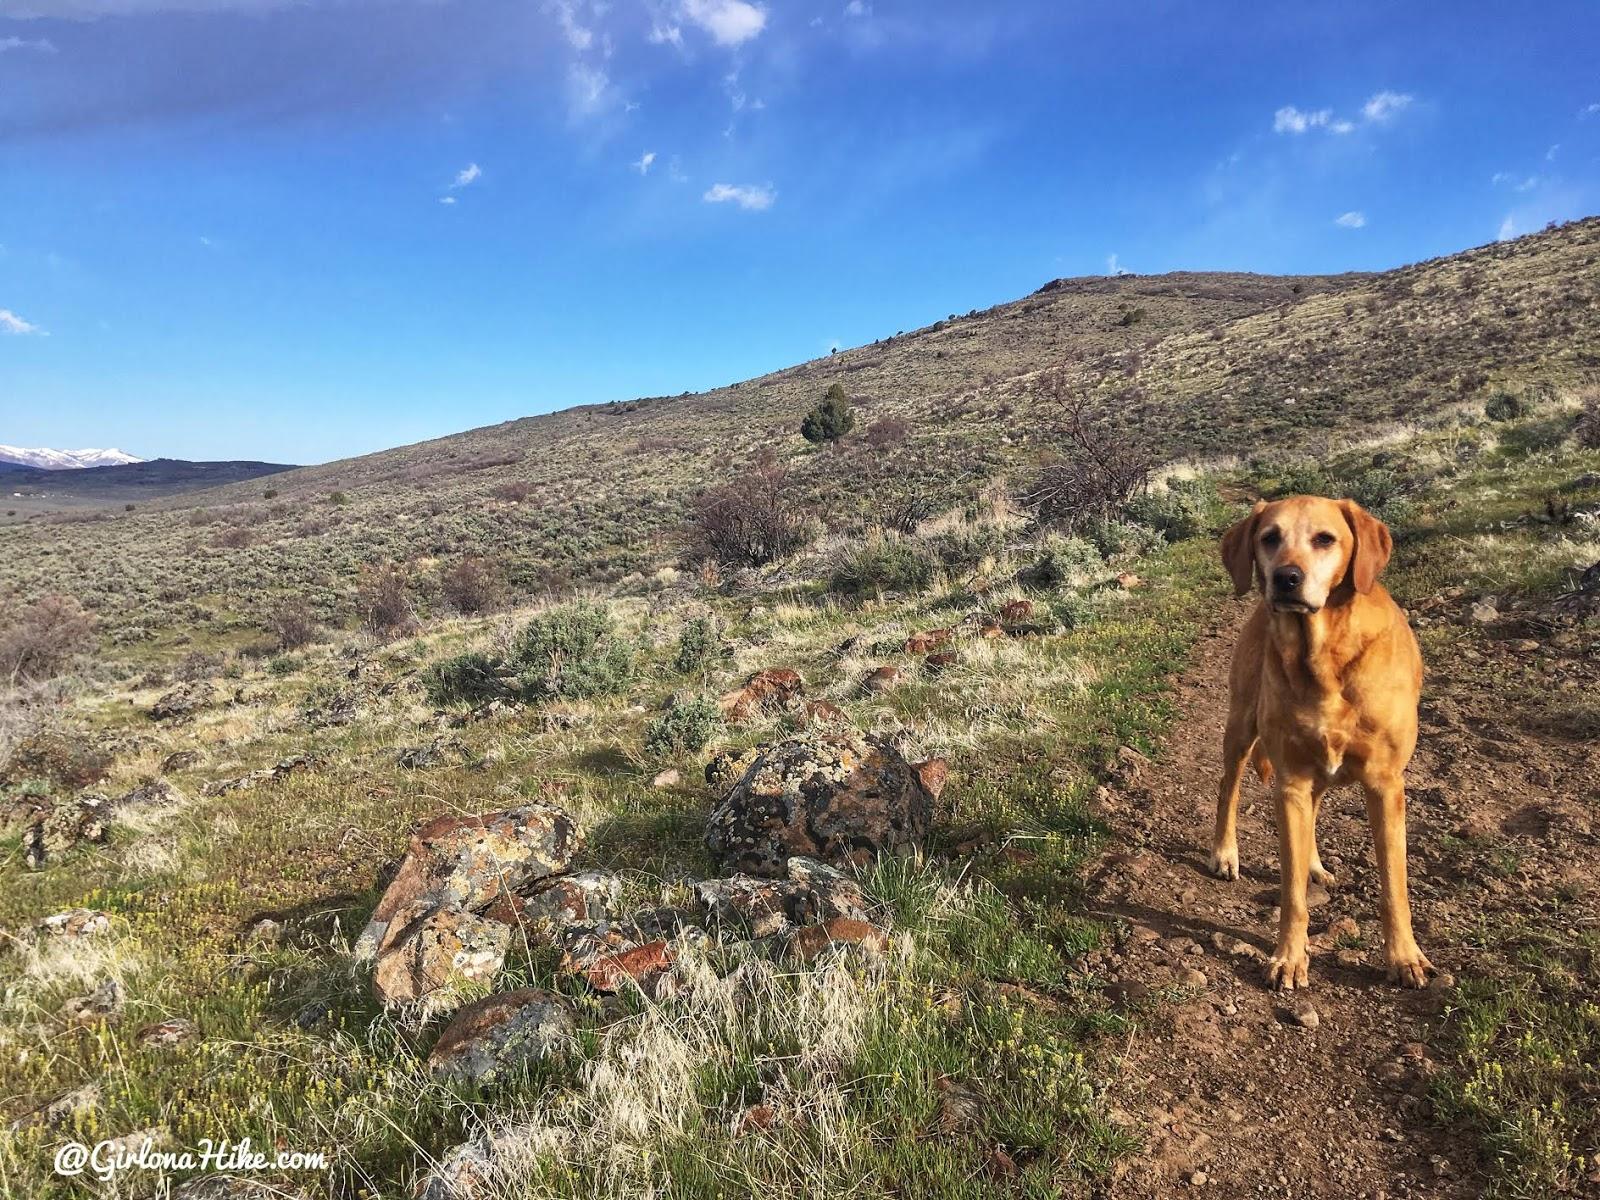 Hiking the Kamas Overlook Trail